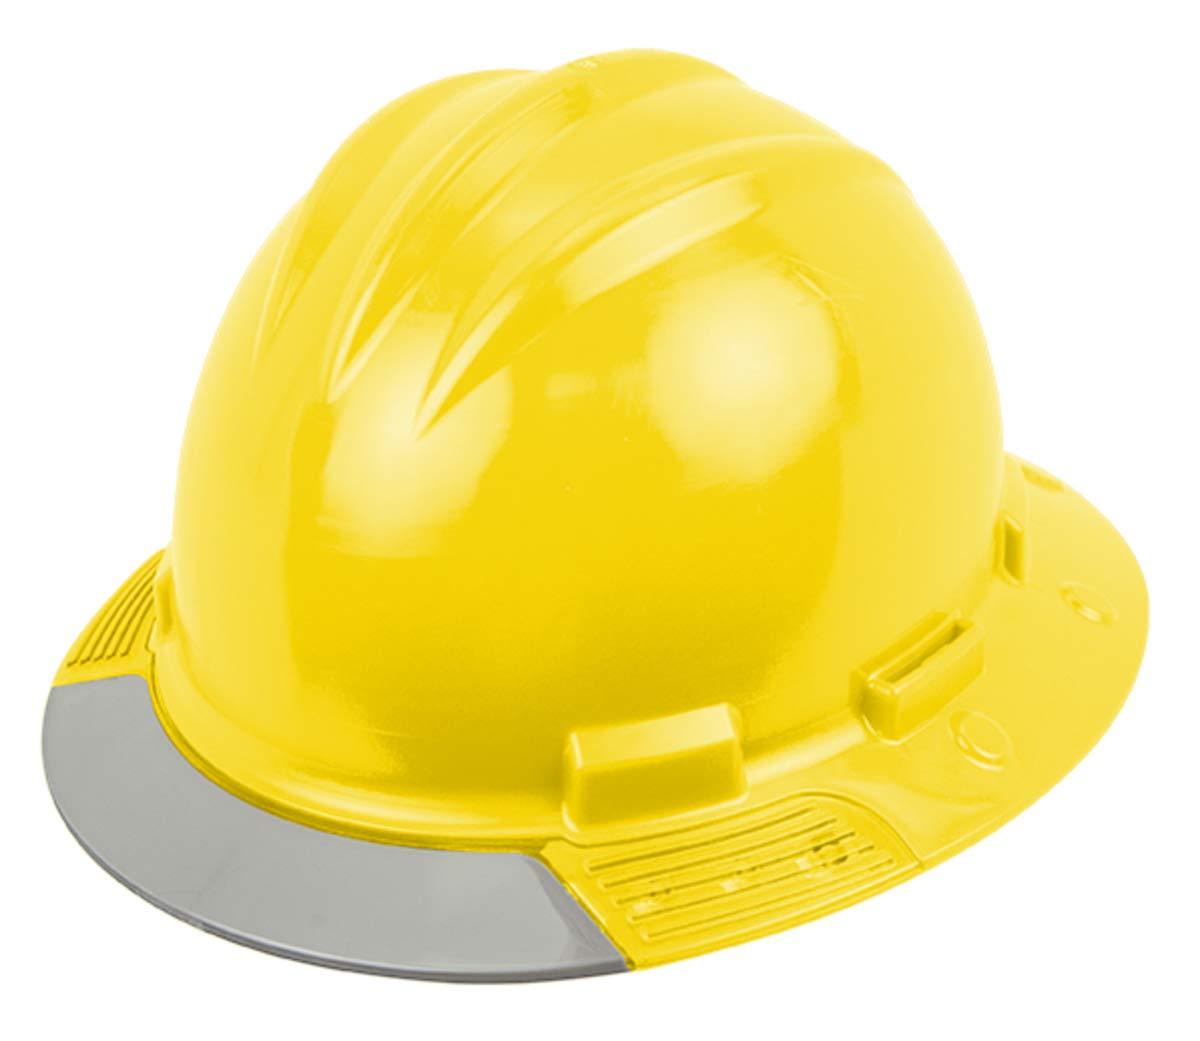 Bullard Yellow AboveView HDPE Full Brim Hard Hat With Flex-Gear 4 Point  Ratchet Suspension 55ff96627